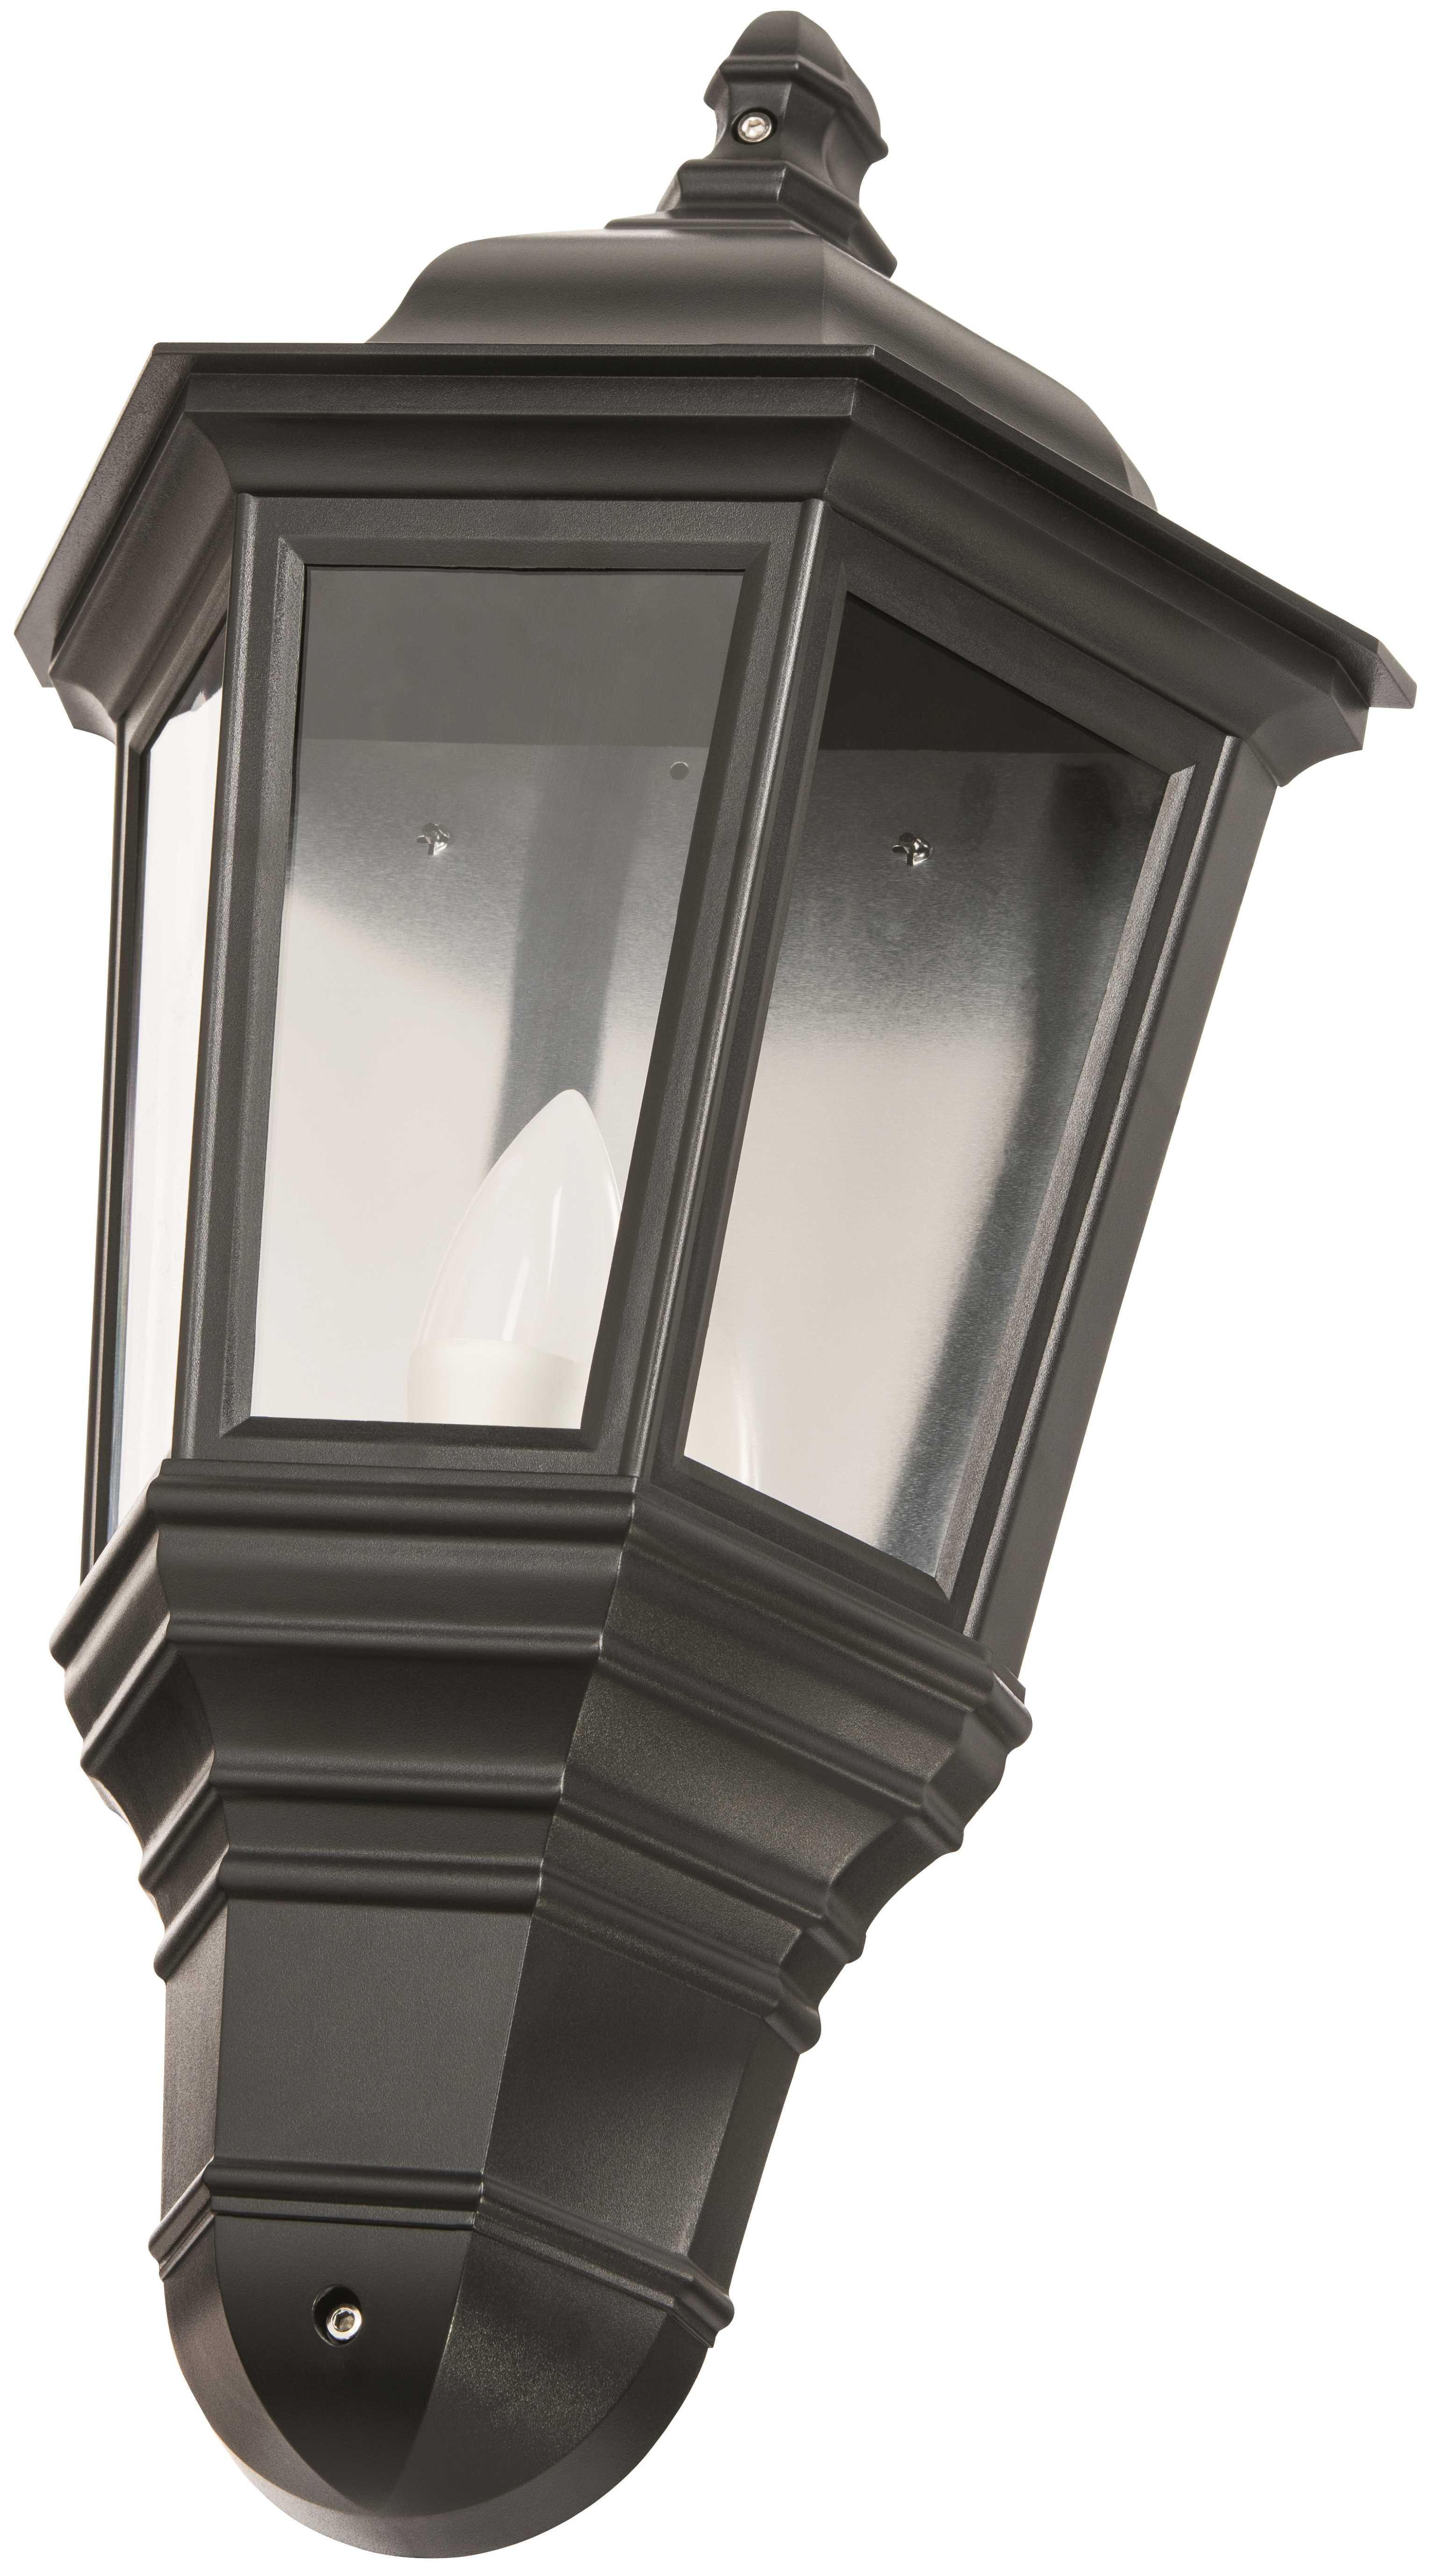 Timeguard CLLEDH42B Black LED Half Carriage Lantern c/w 4w LED Candle Lamp